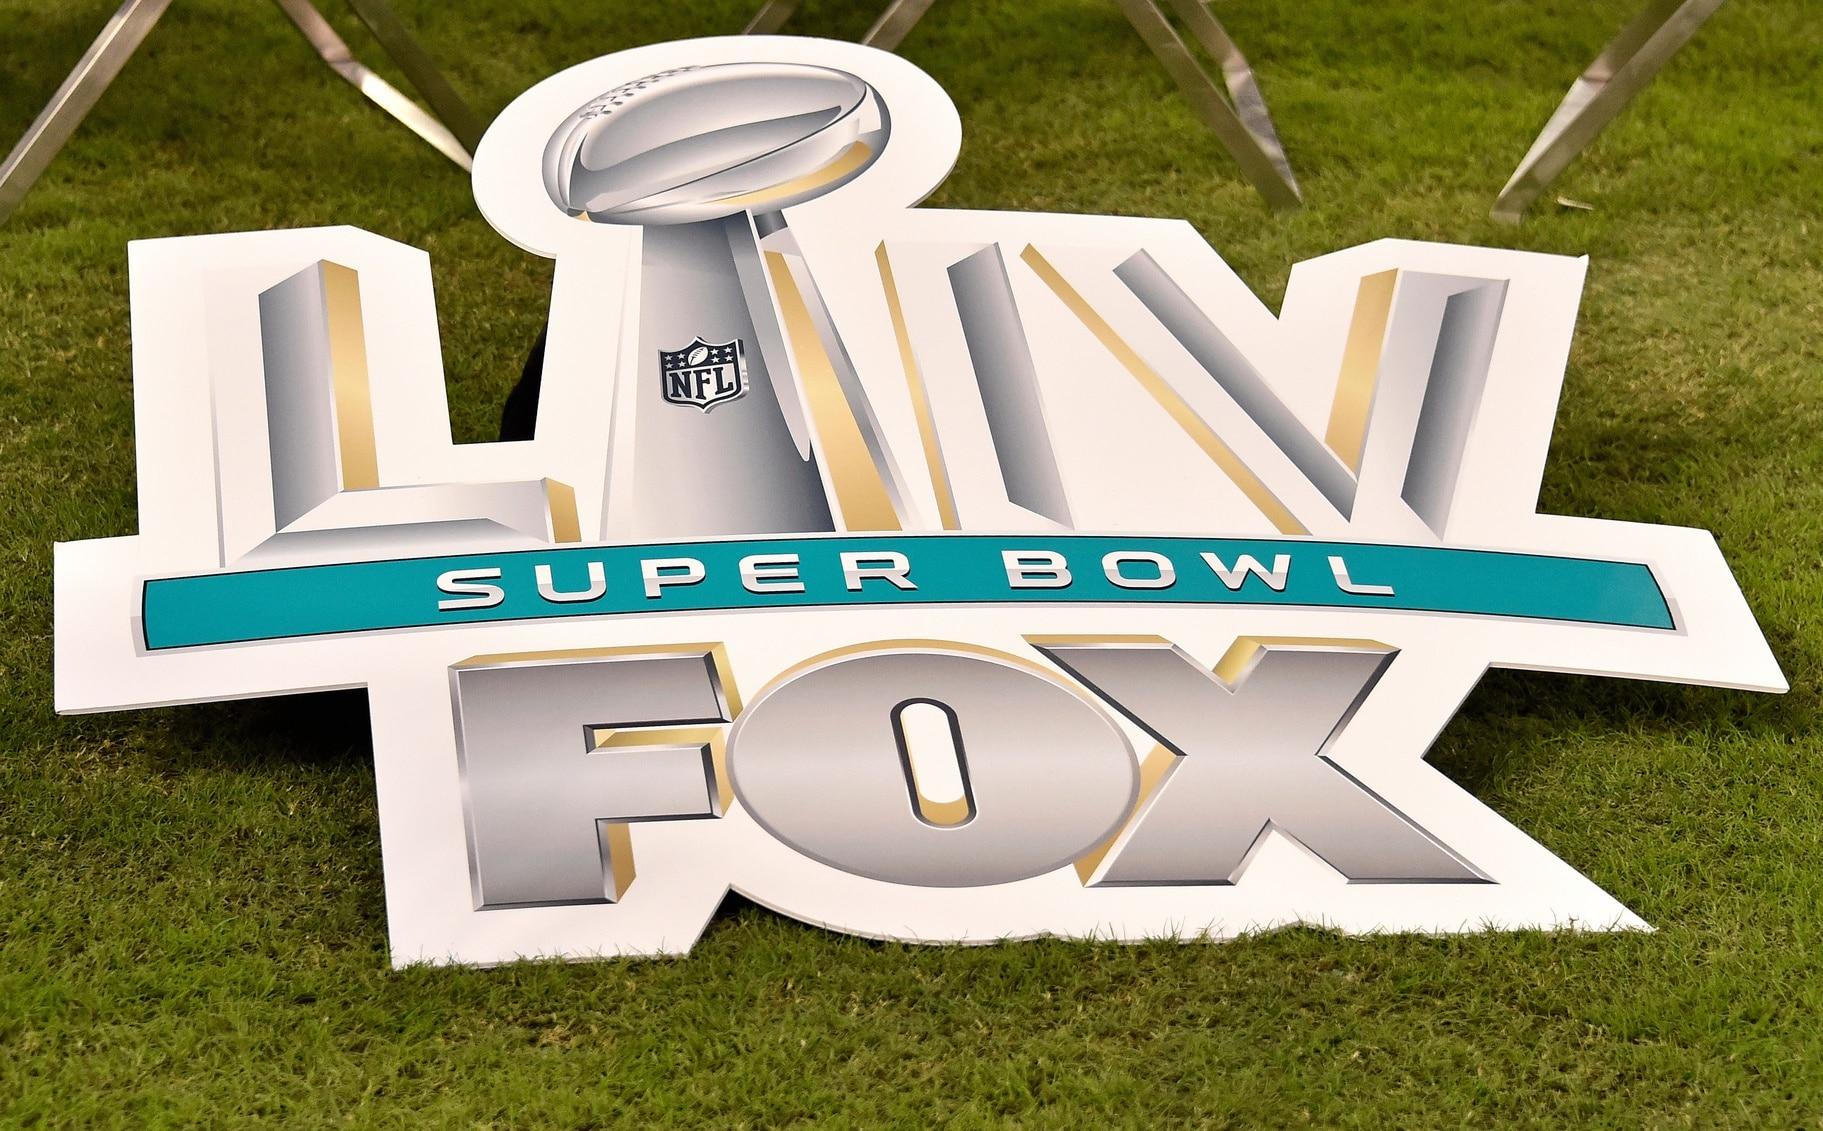 Jennifer Lopez Shakira to perform at Super Bowl LIV halftime show 1823x1131